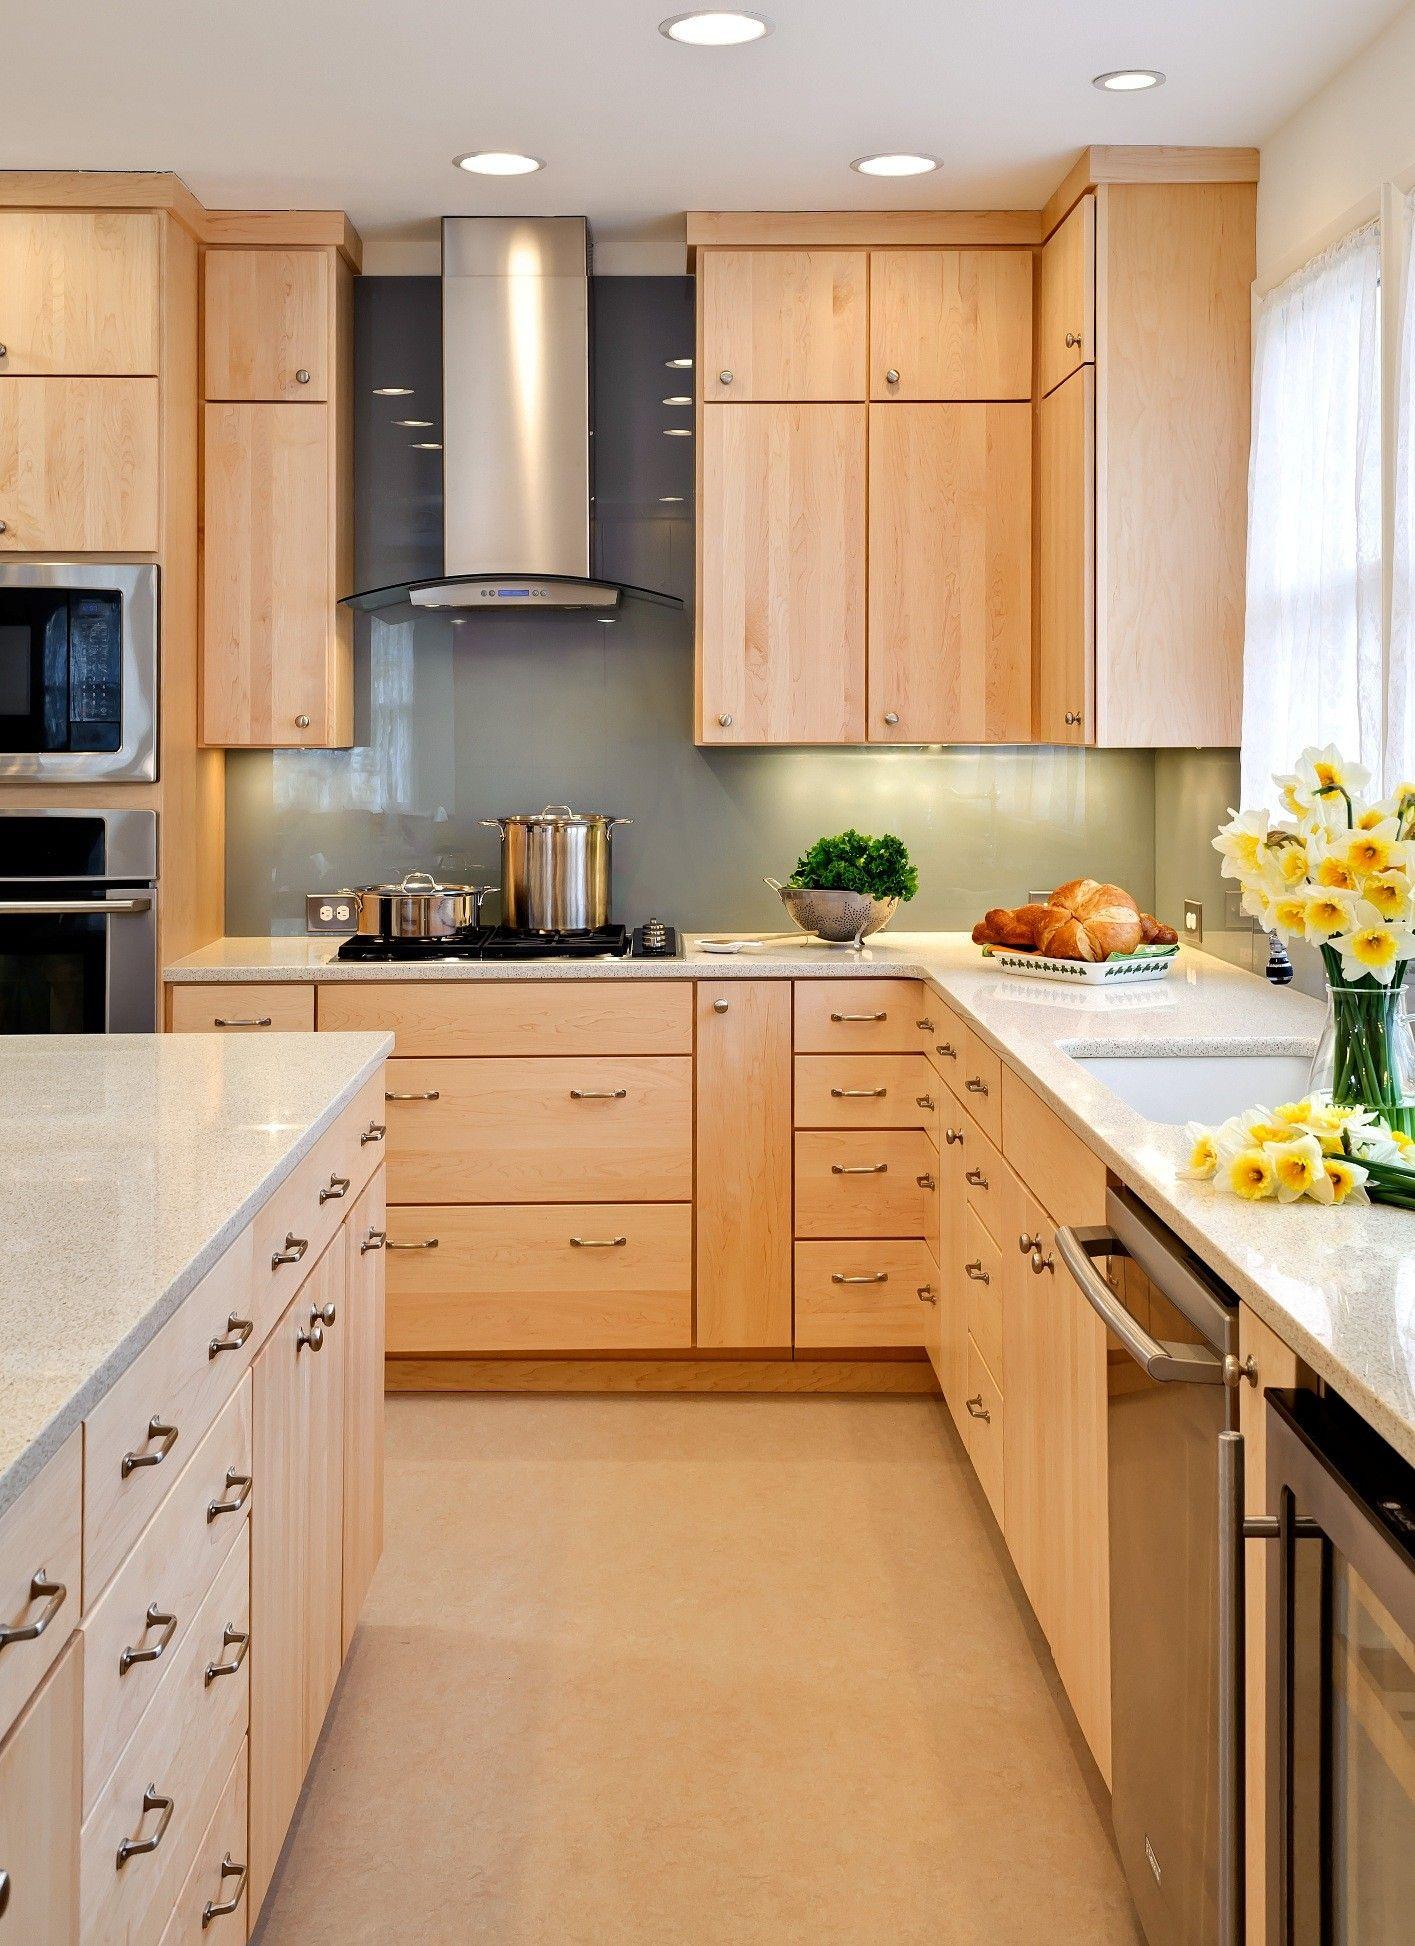 Shawna S Glamorous Custom Kitchen Kitchen Drawer Organization Storage Cabinets Custom Kitchen